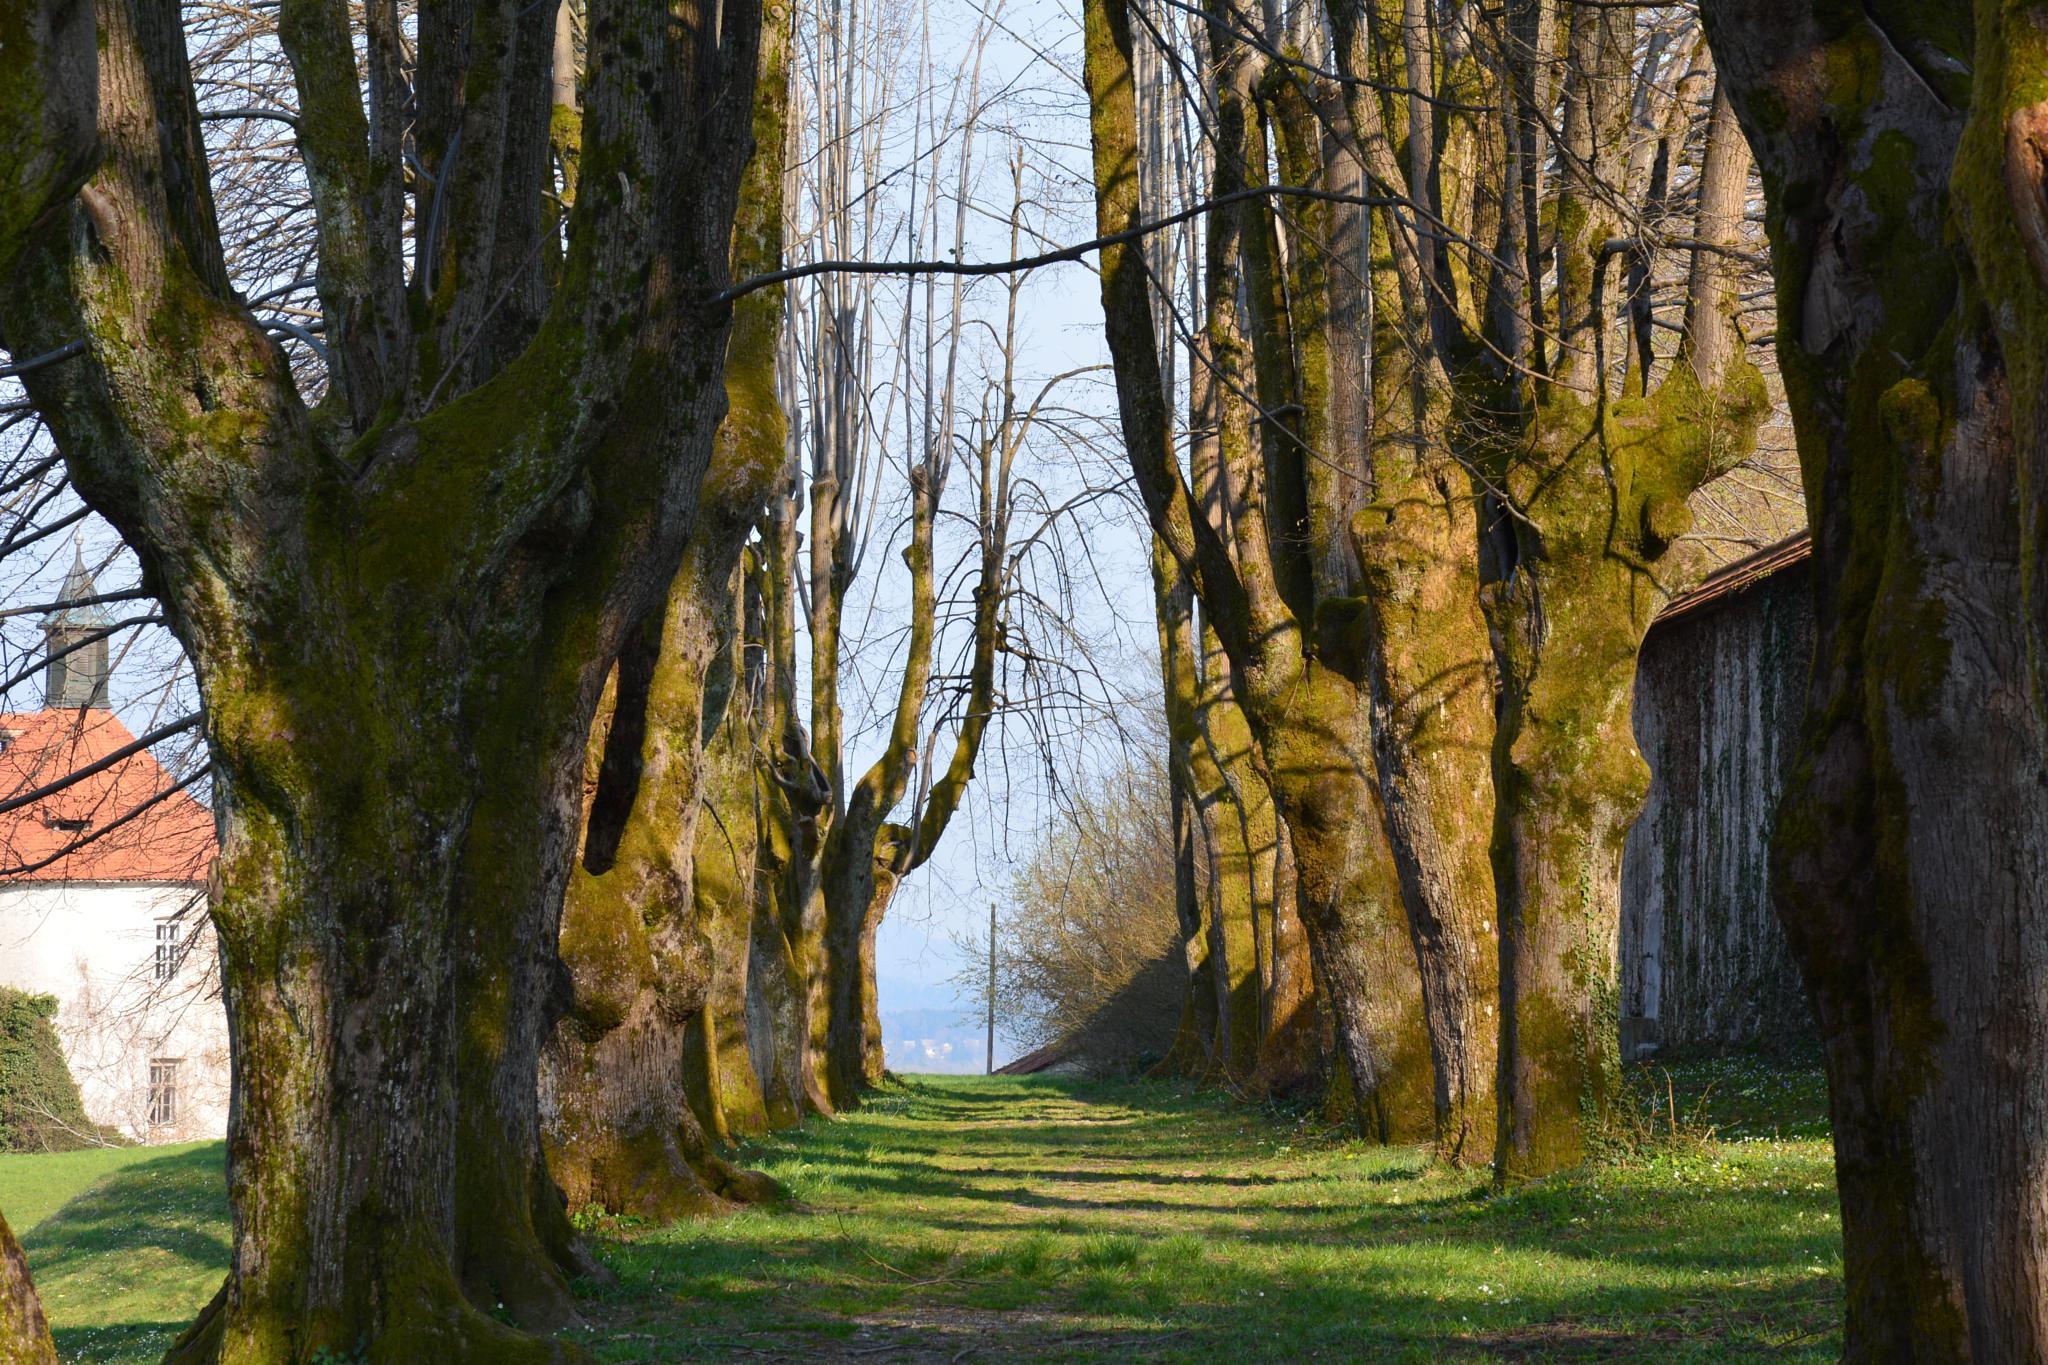 On the walk by Egon Cokan